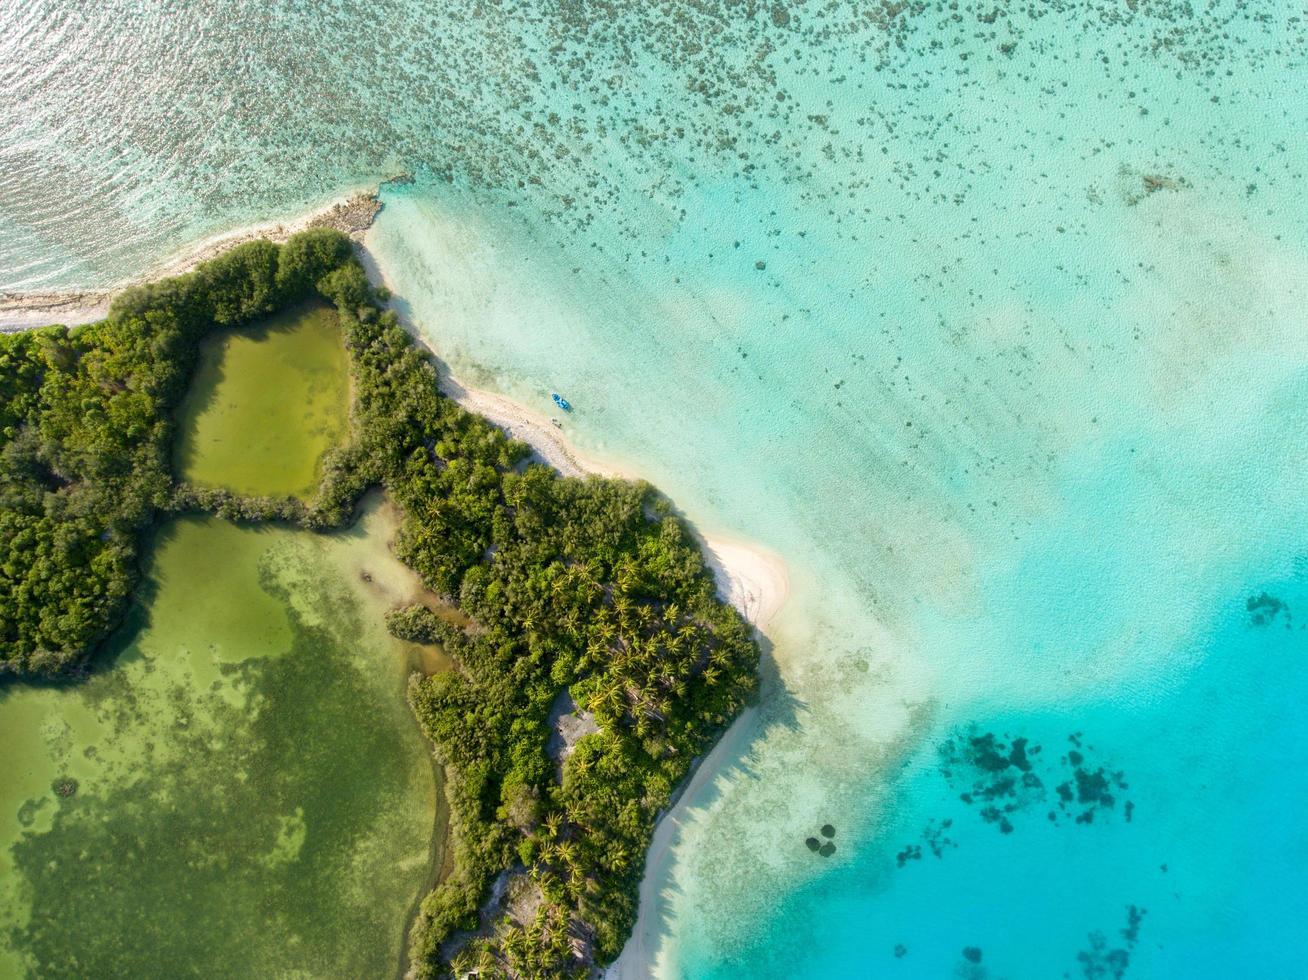 vista aérea de una isla verde foto